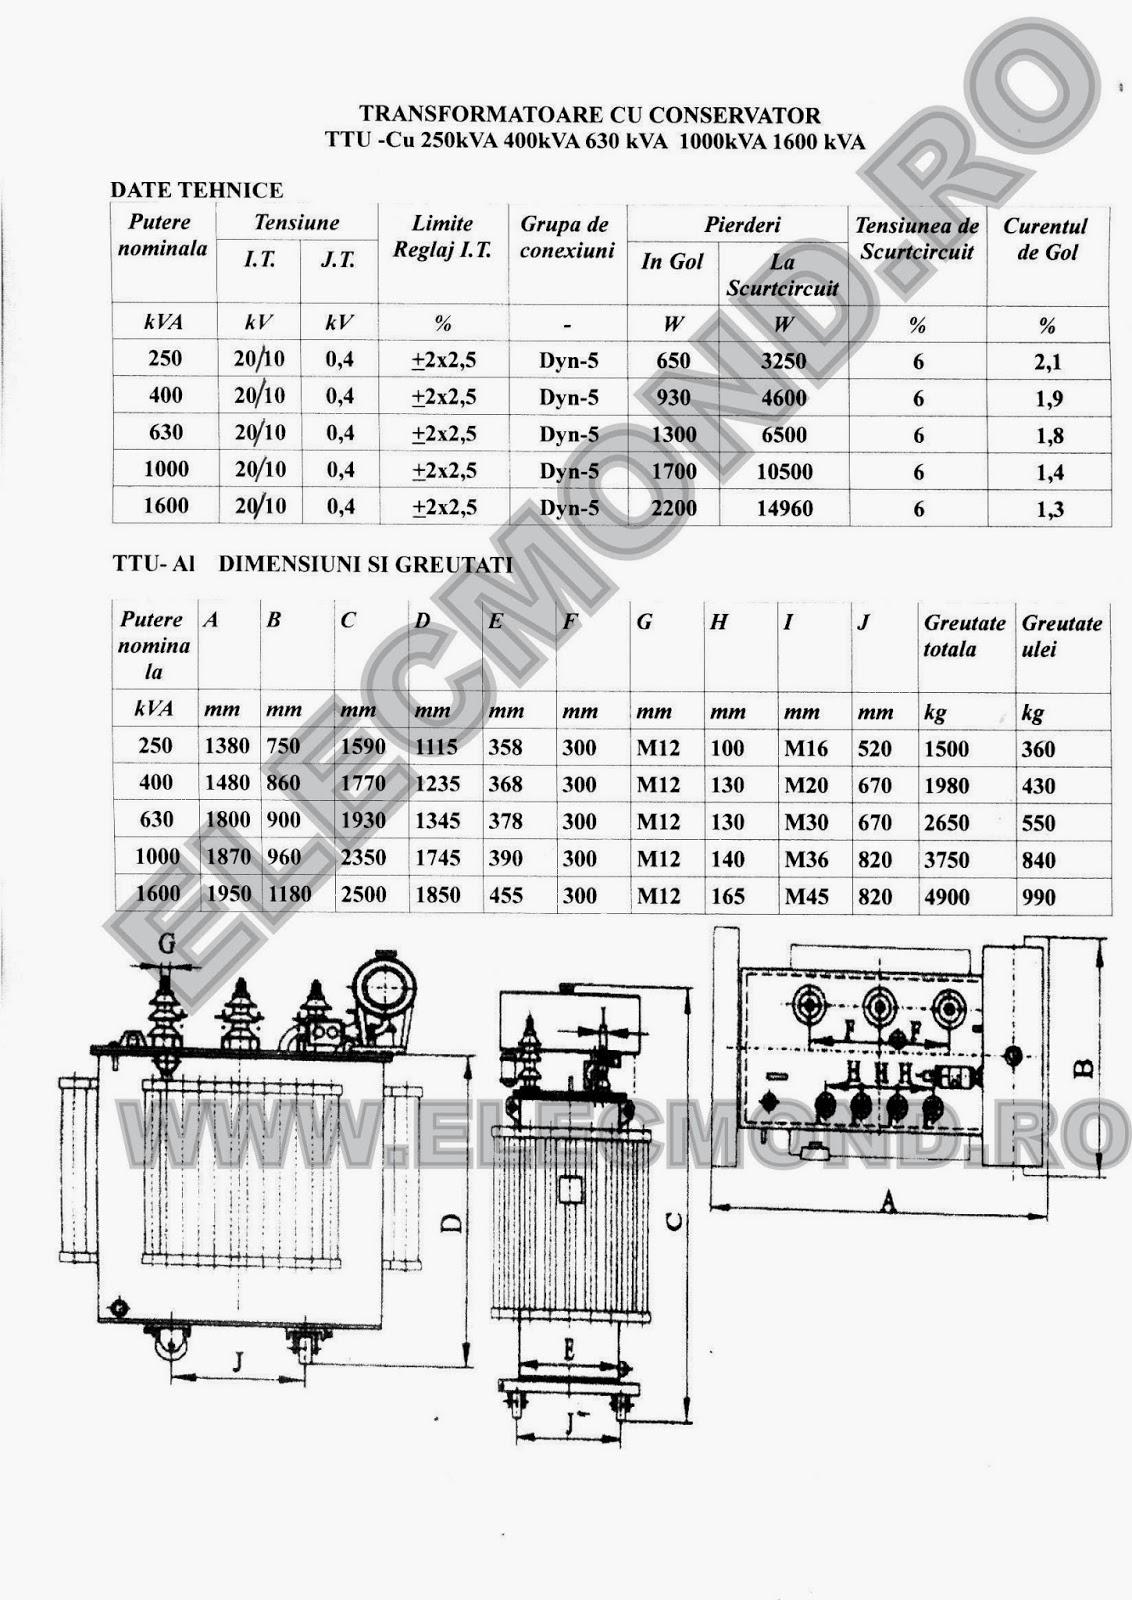 DATE TEHNICE TRANSFORMATOARE CU CONSERVATOR CUPRU 250 kVA 400 kVA 630 kVA 1000 kVA 1600 kVA